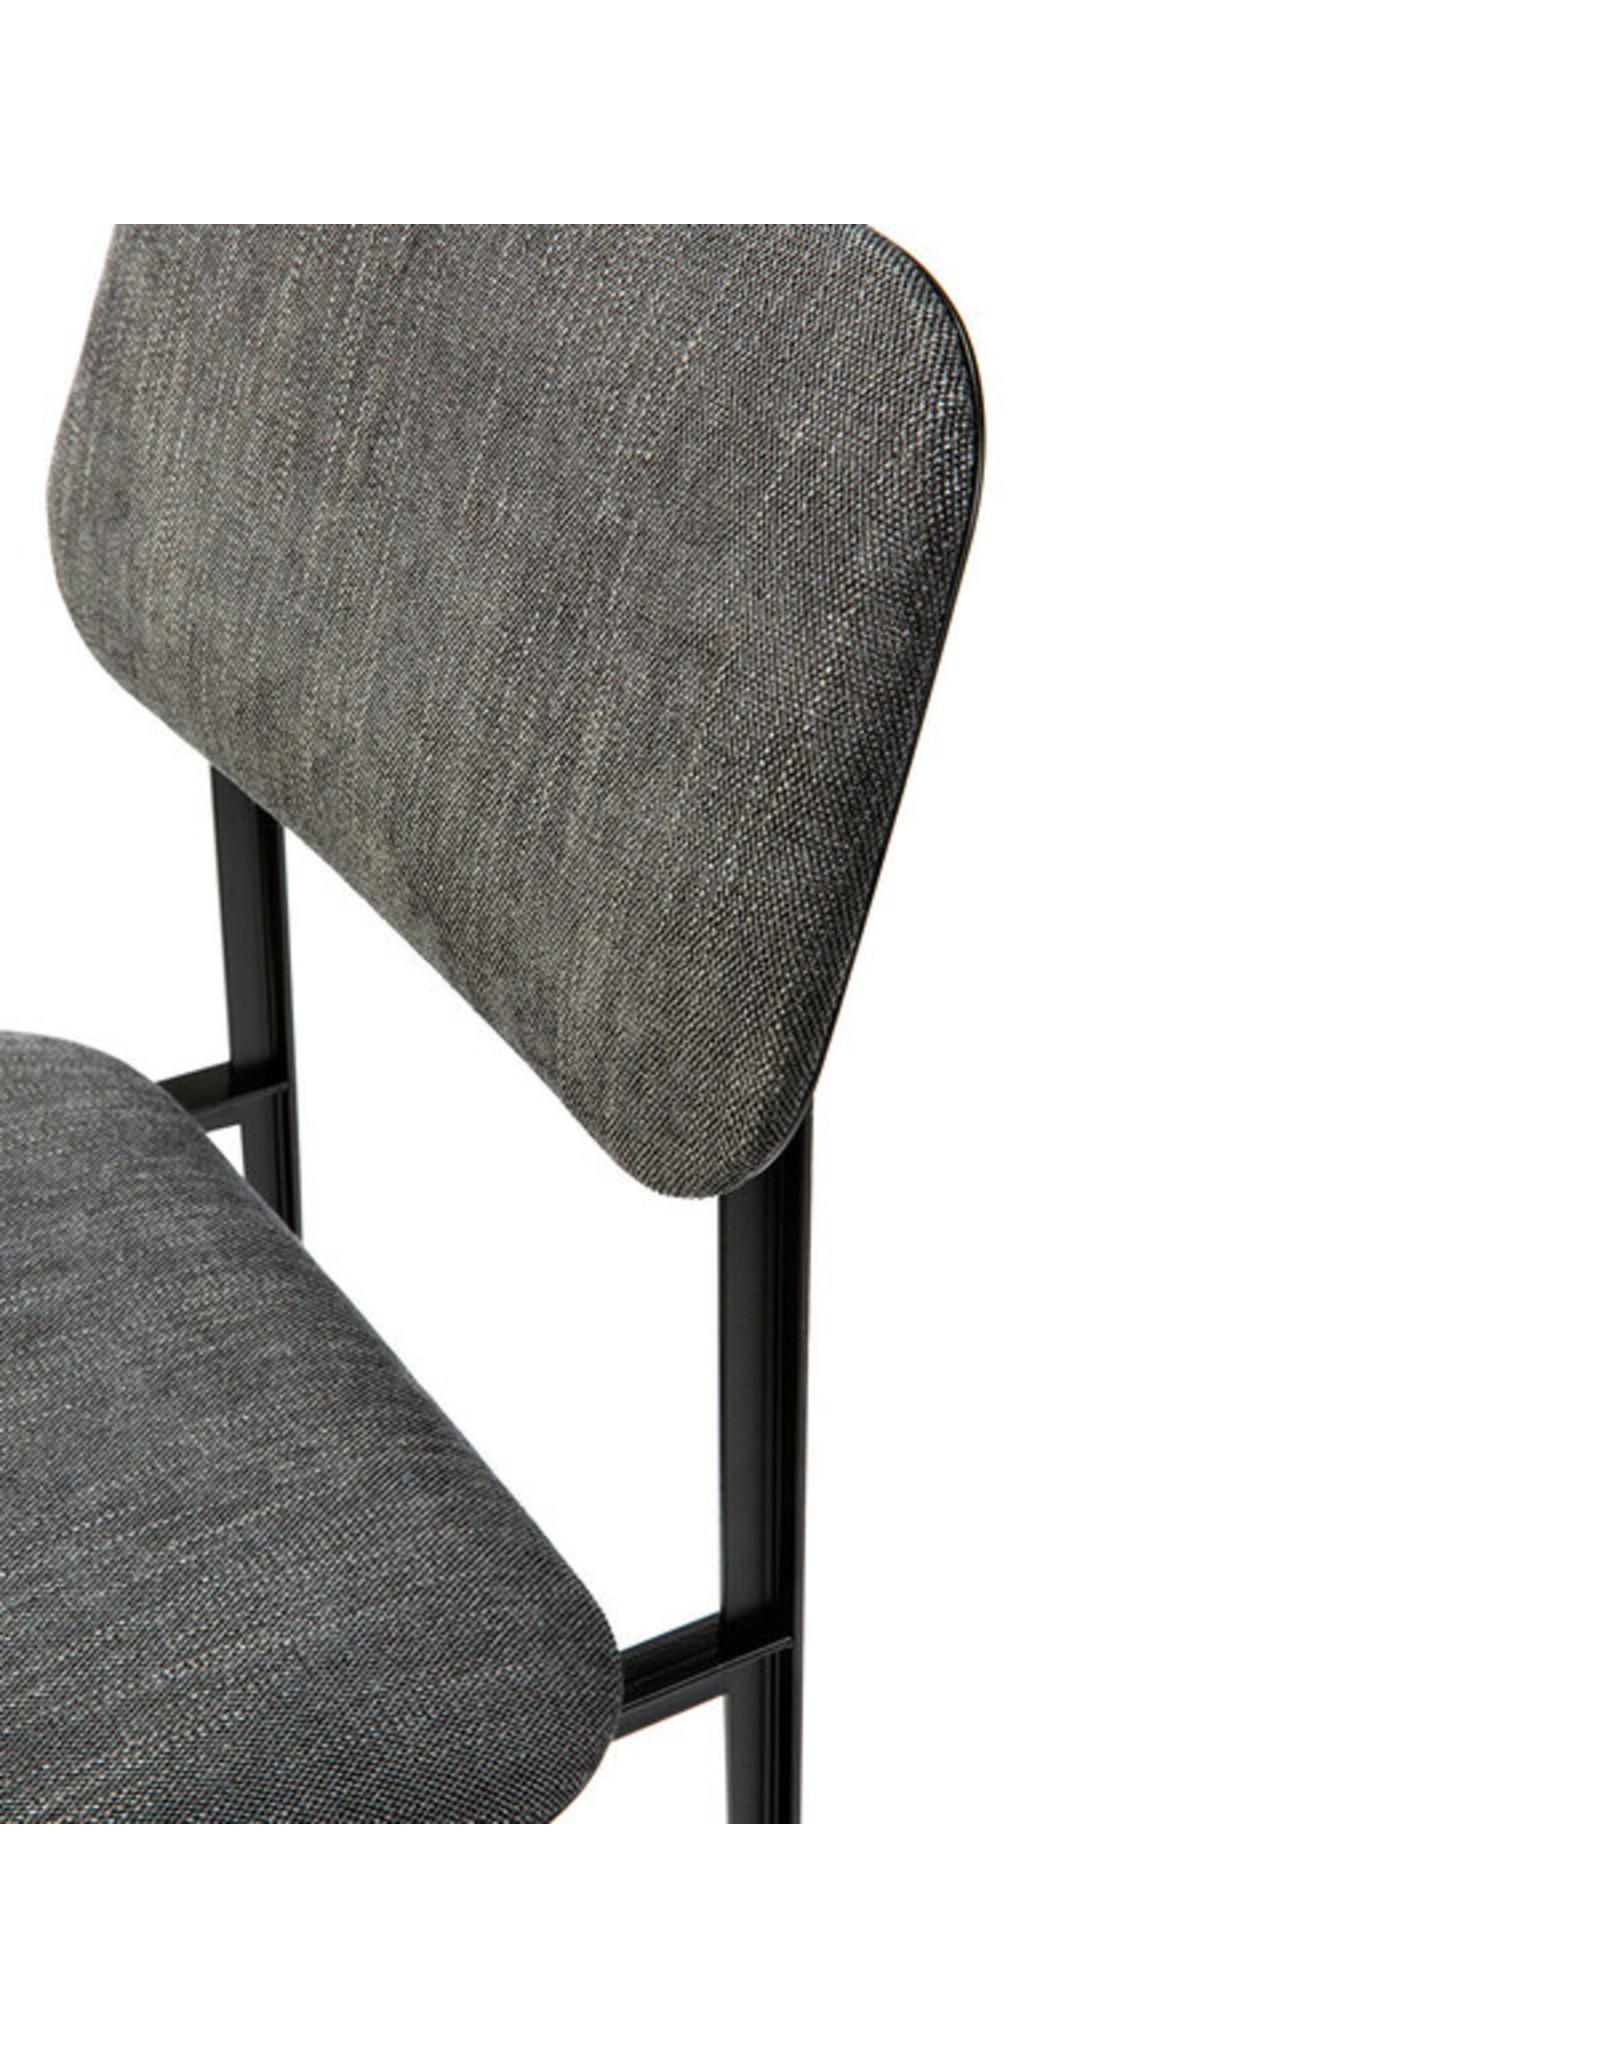 Ethnicraft DC Dining Chair, Dark Grey